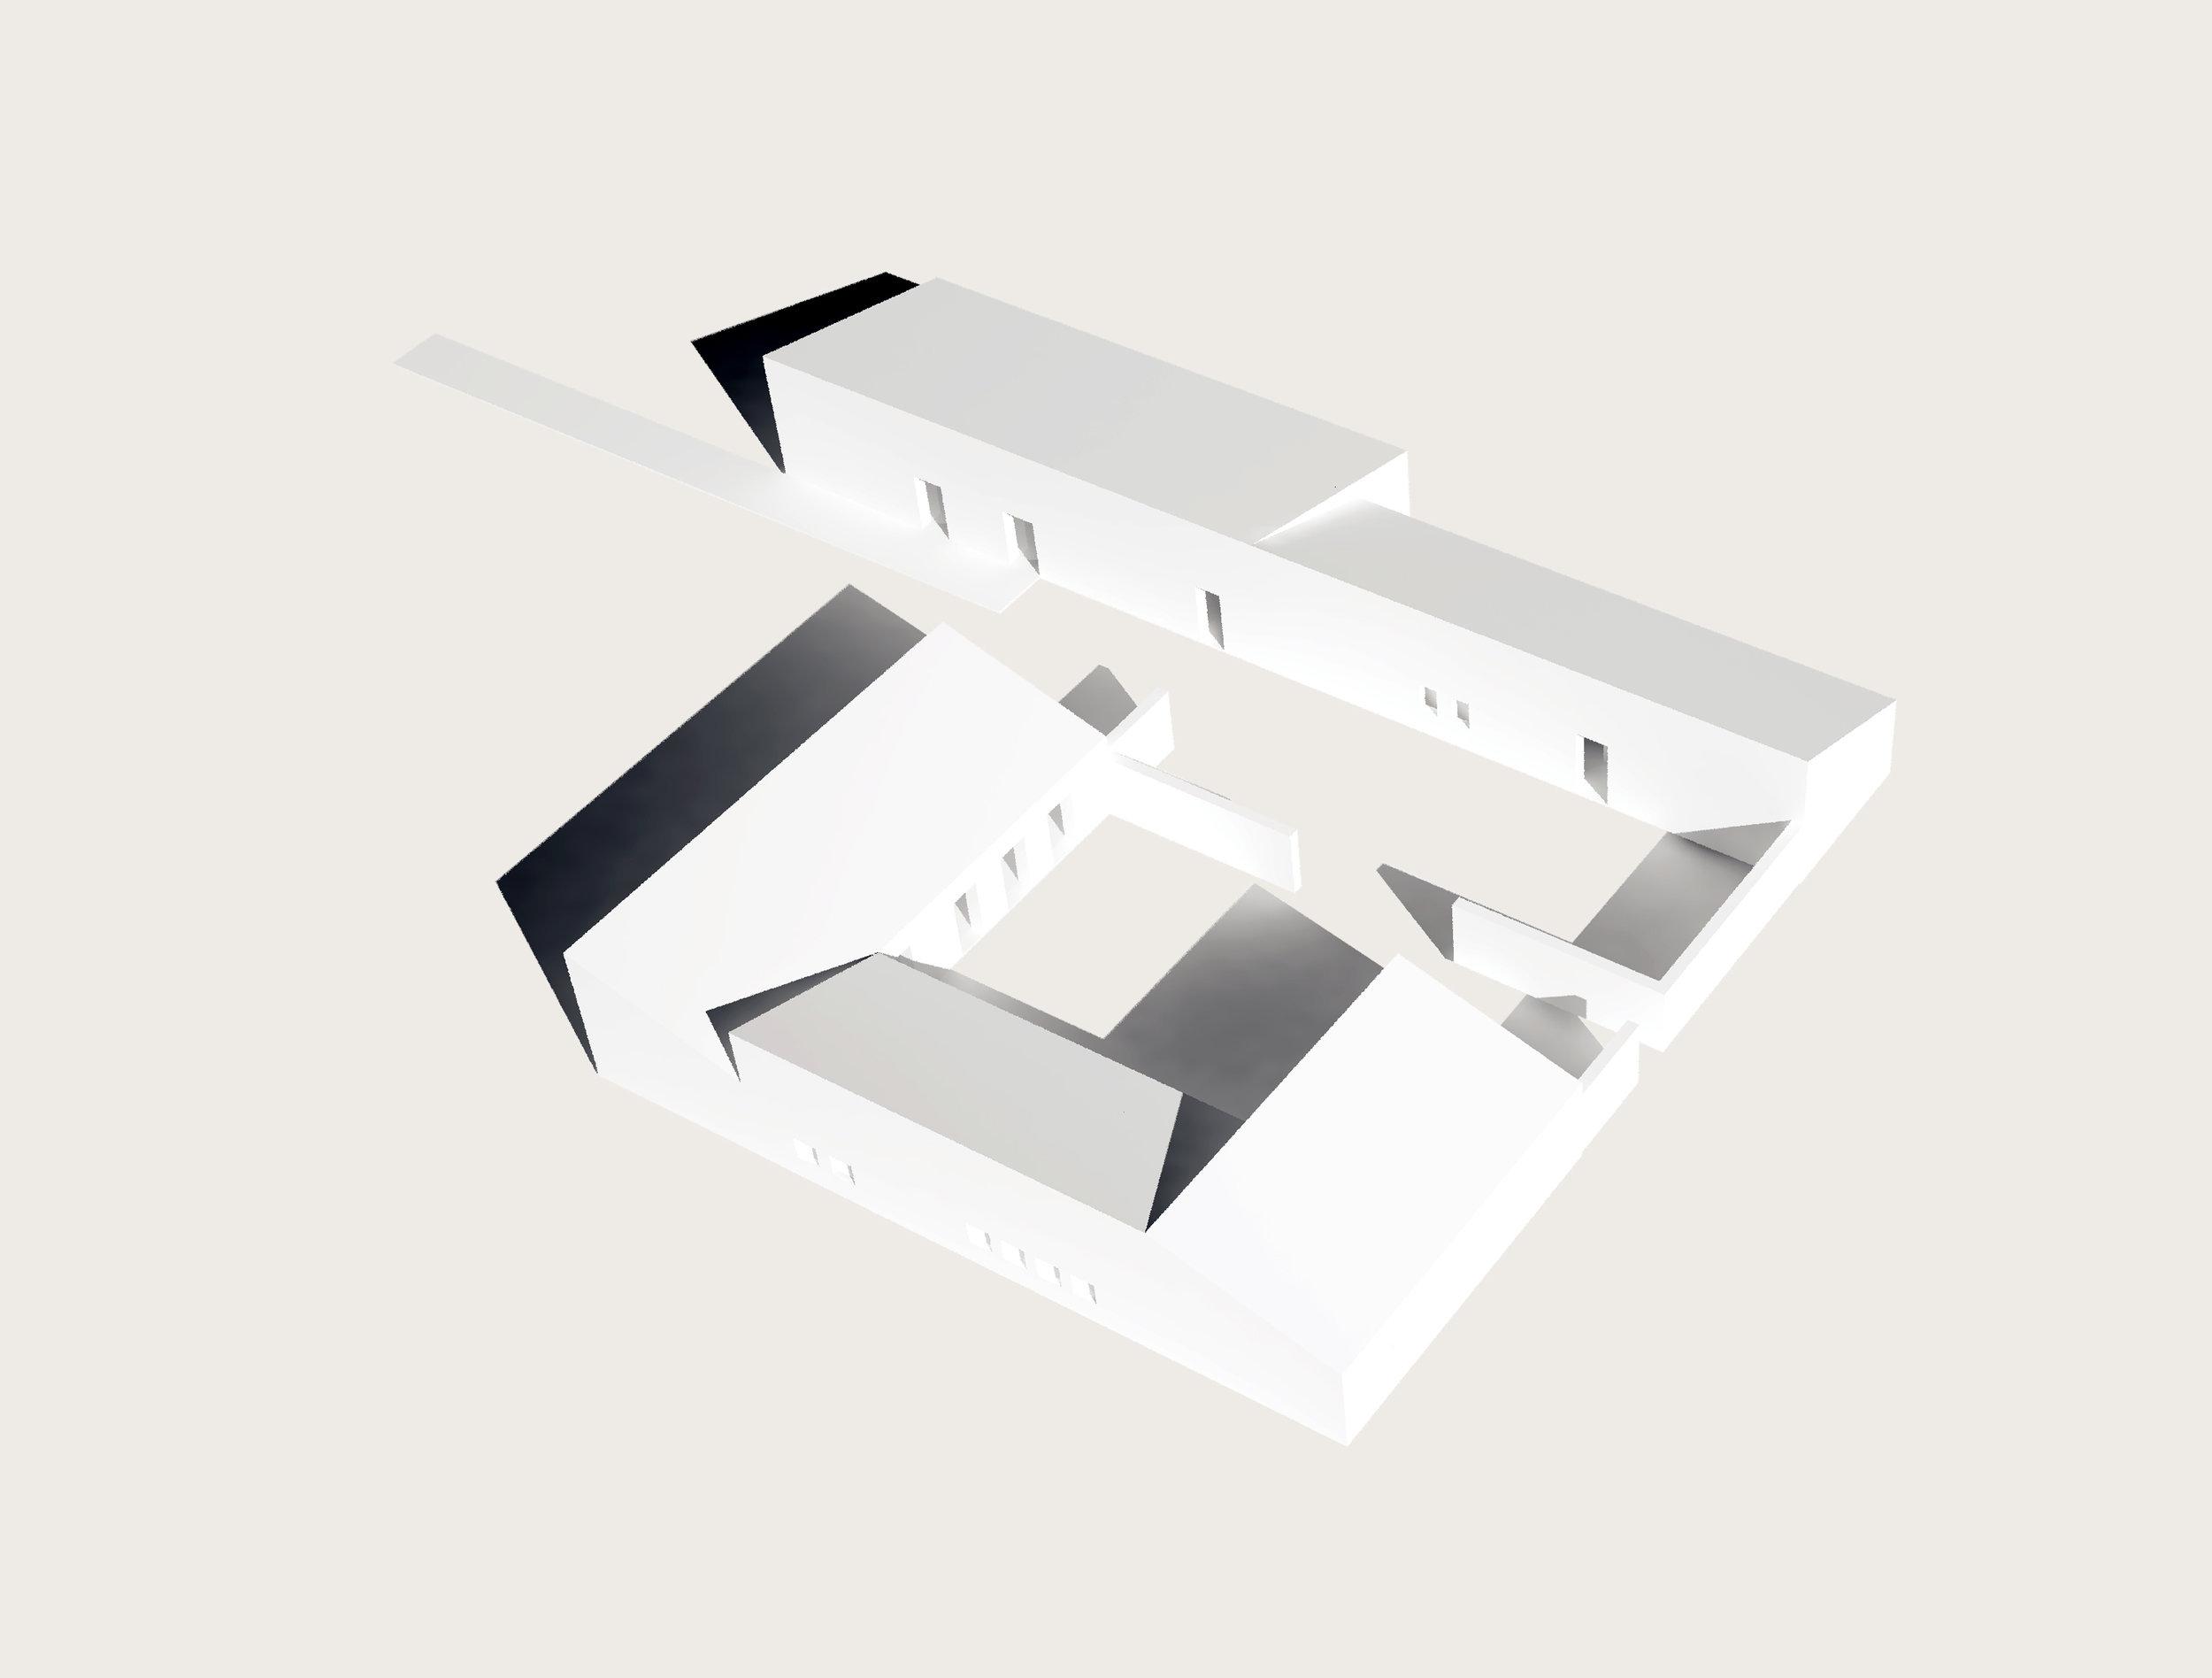 Raams-Architecture-Design-Studio-hrb-house-Spain-rural-ruralretreat-housing-02.jpg